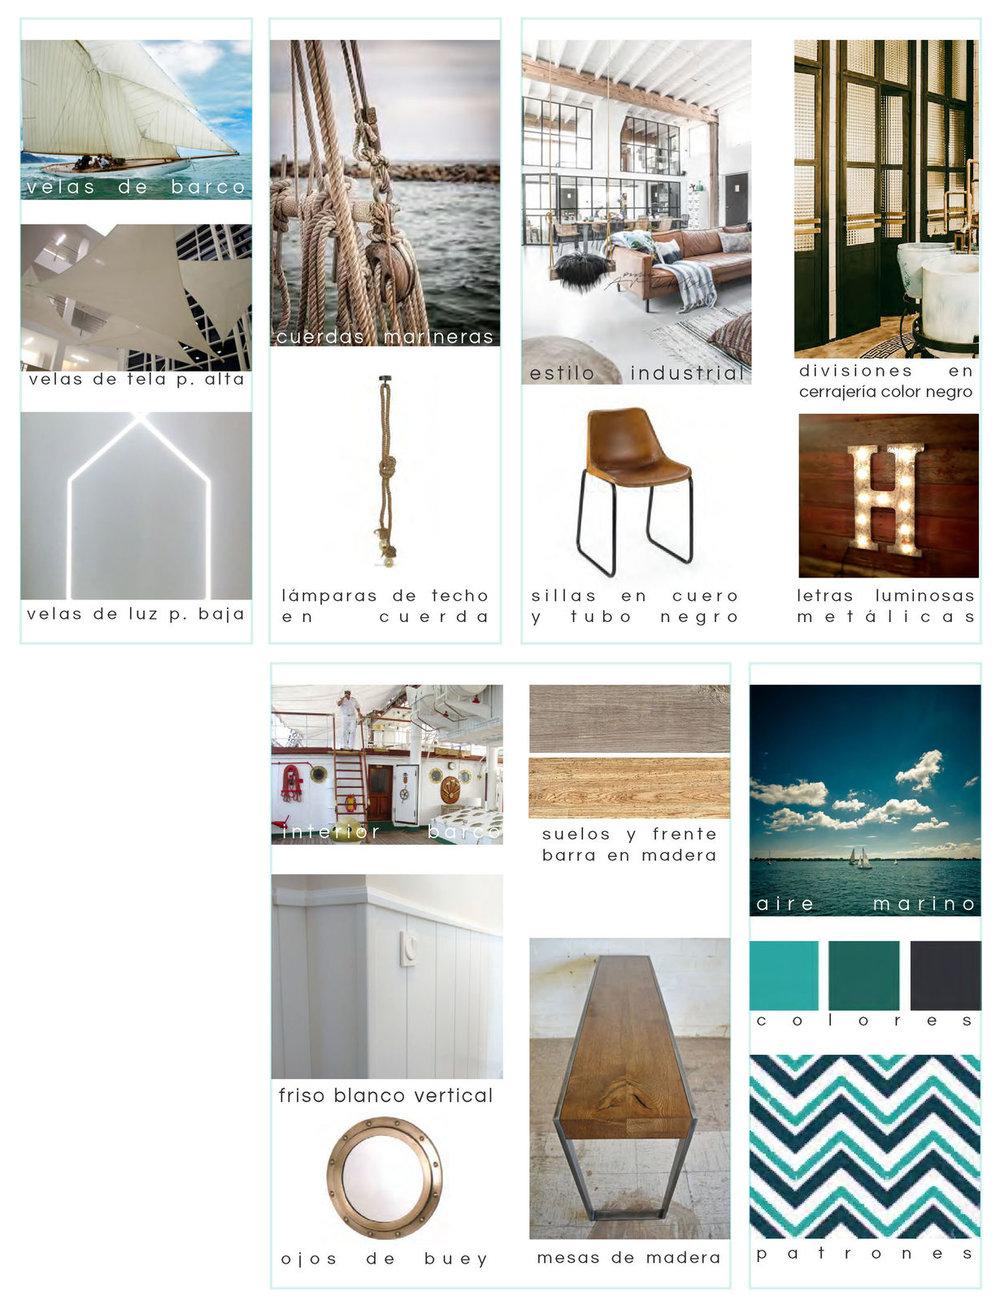 emmme studio restaurante Elcano mobiliario proyecto.jpg